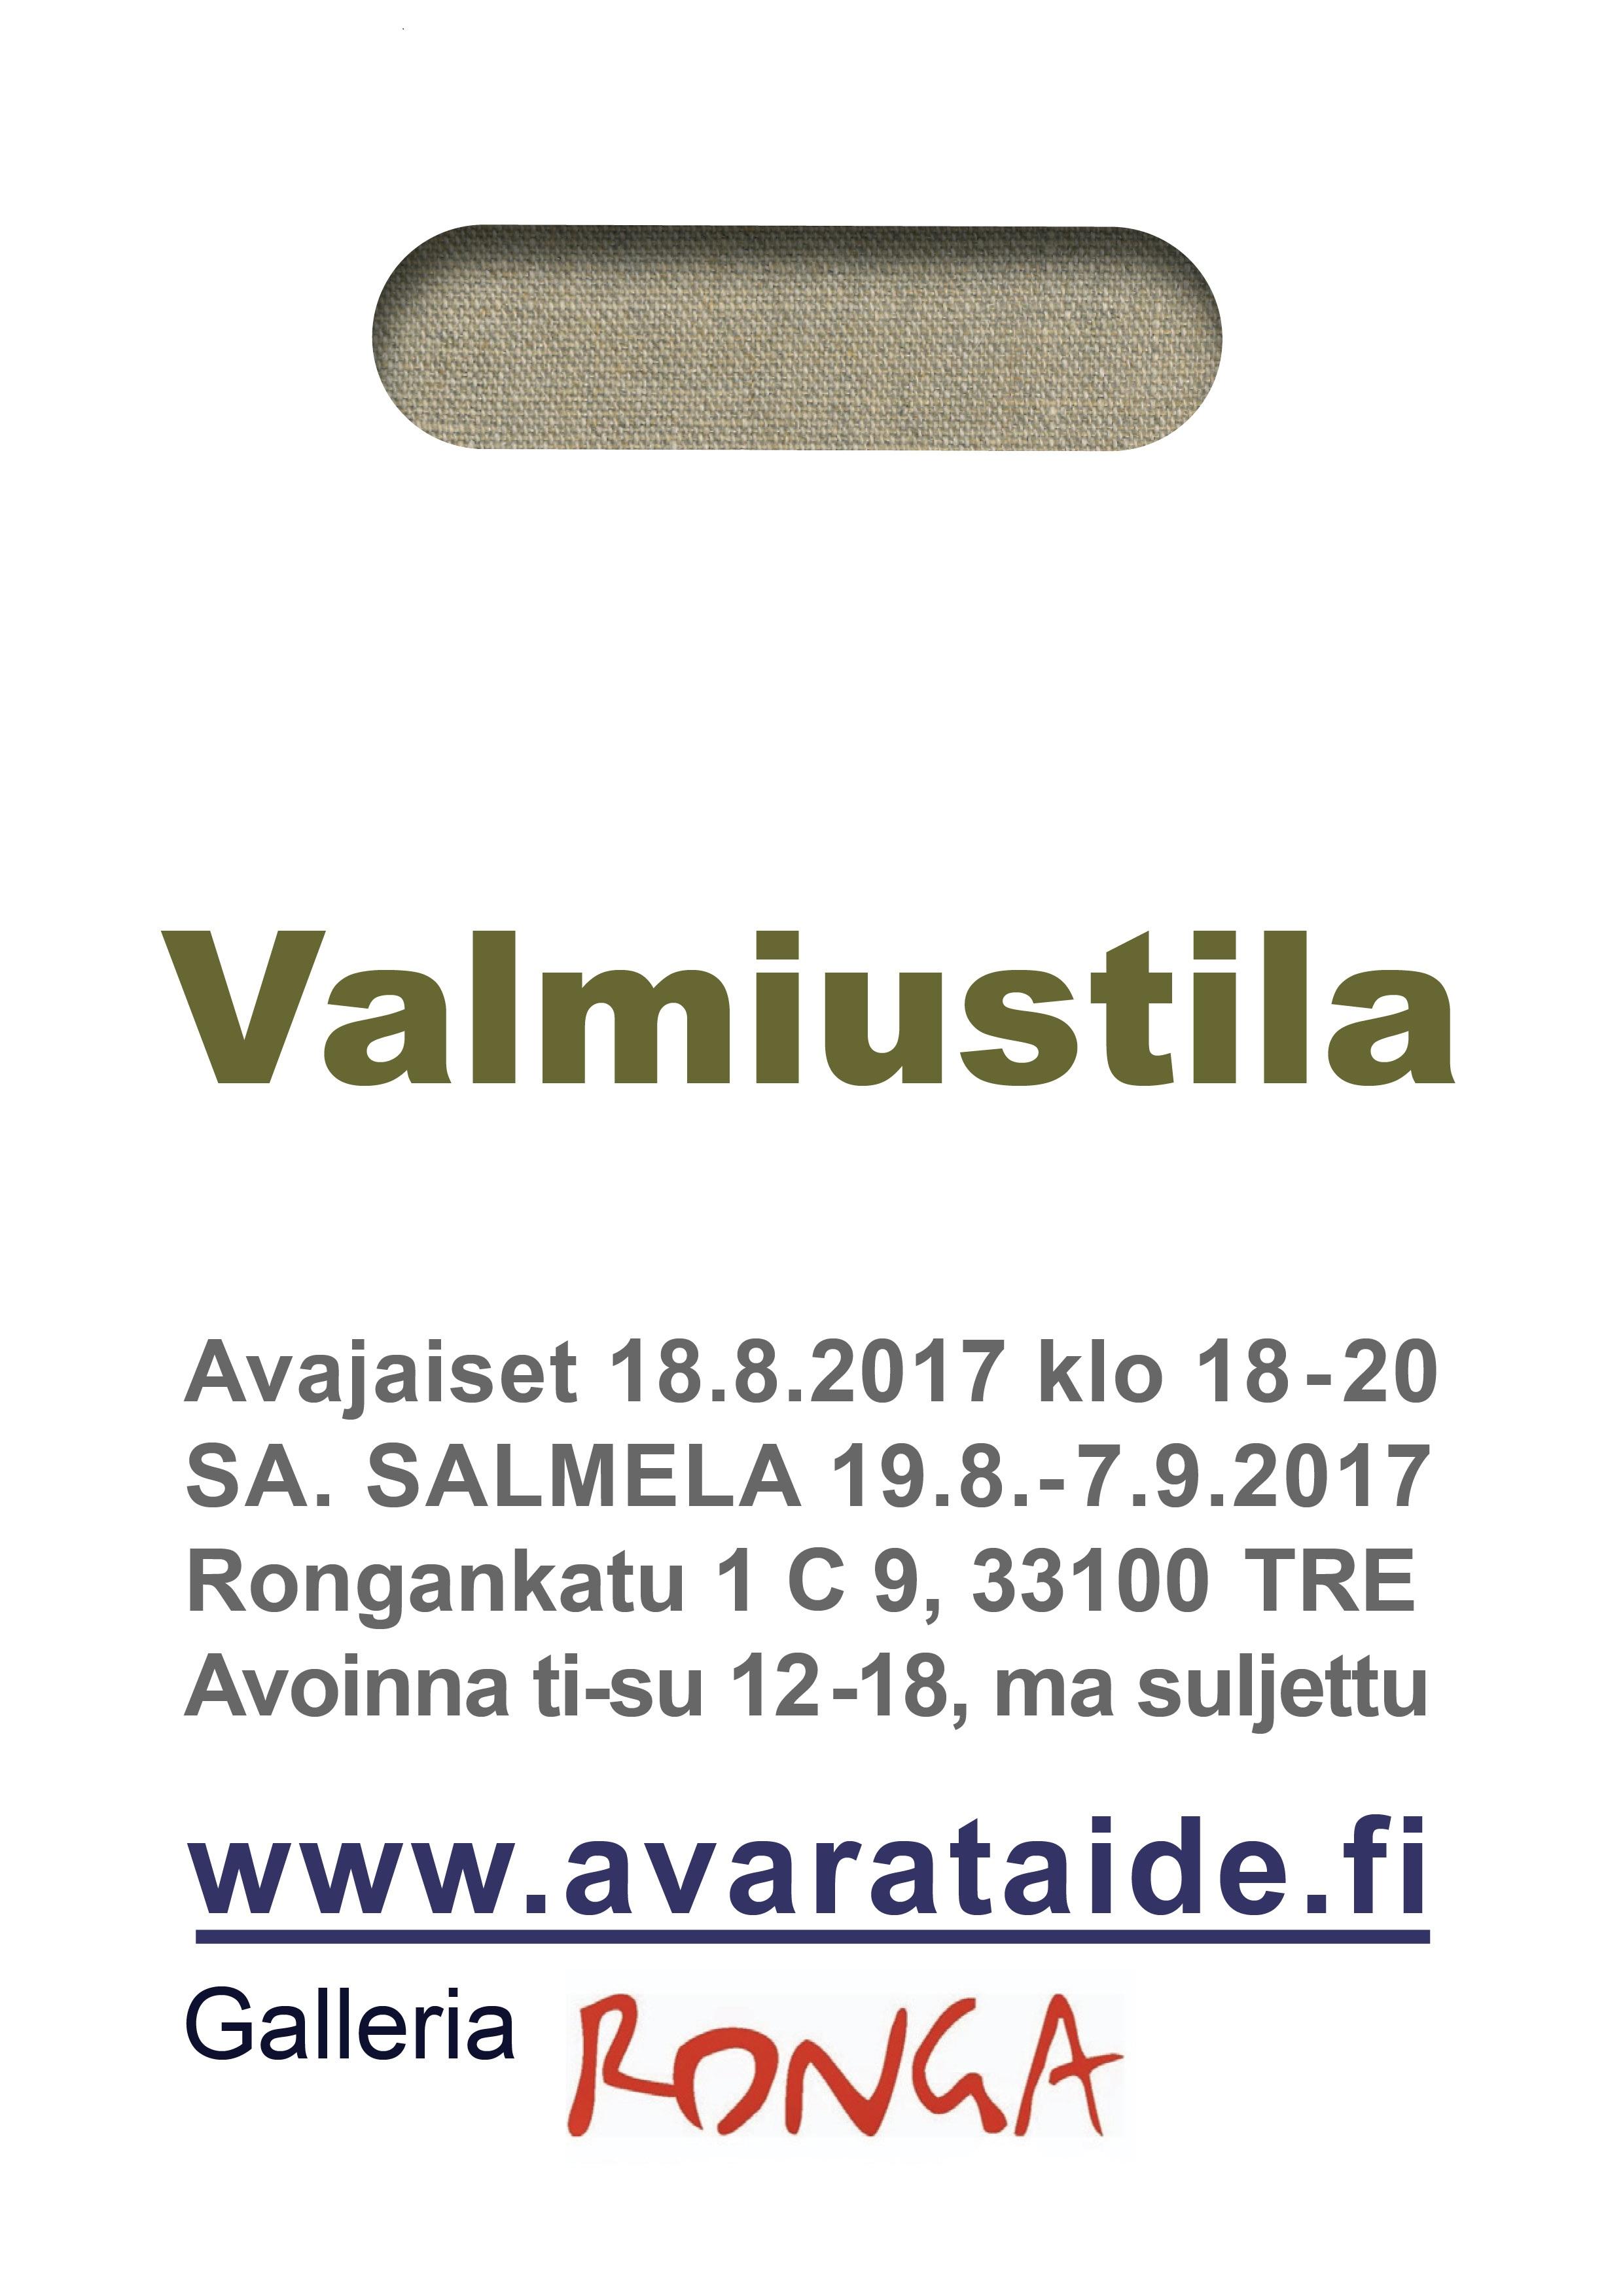 Valmiustila_A6_SA.